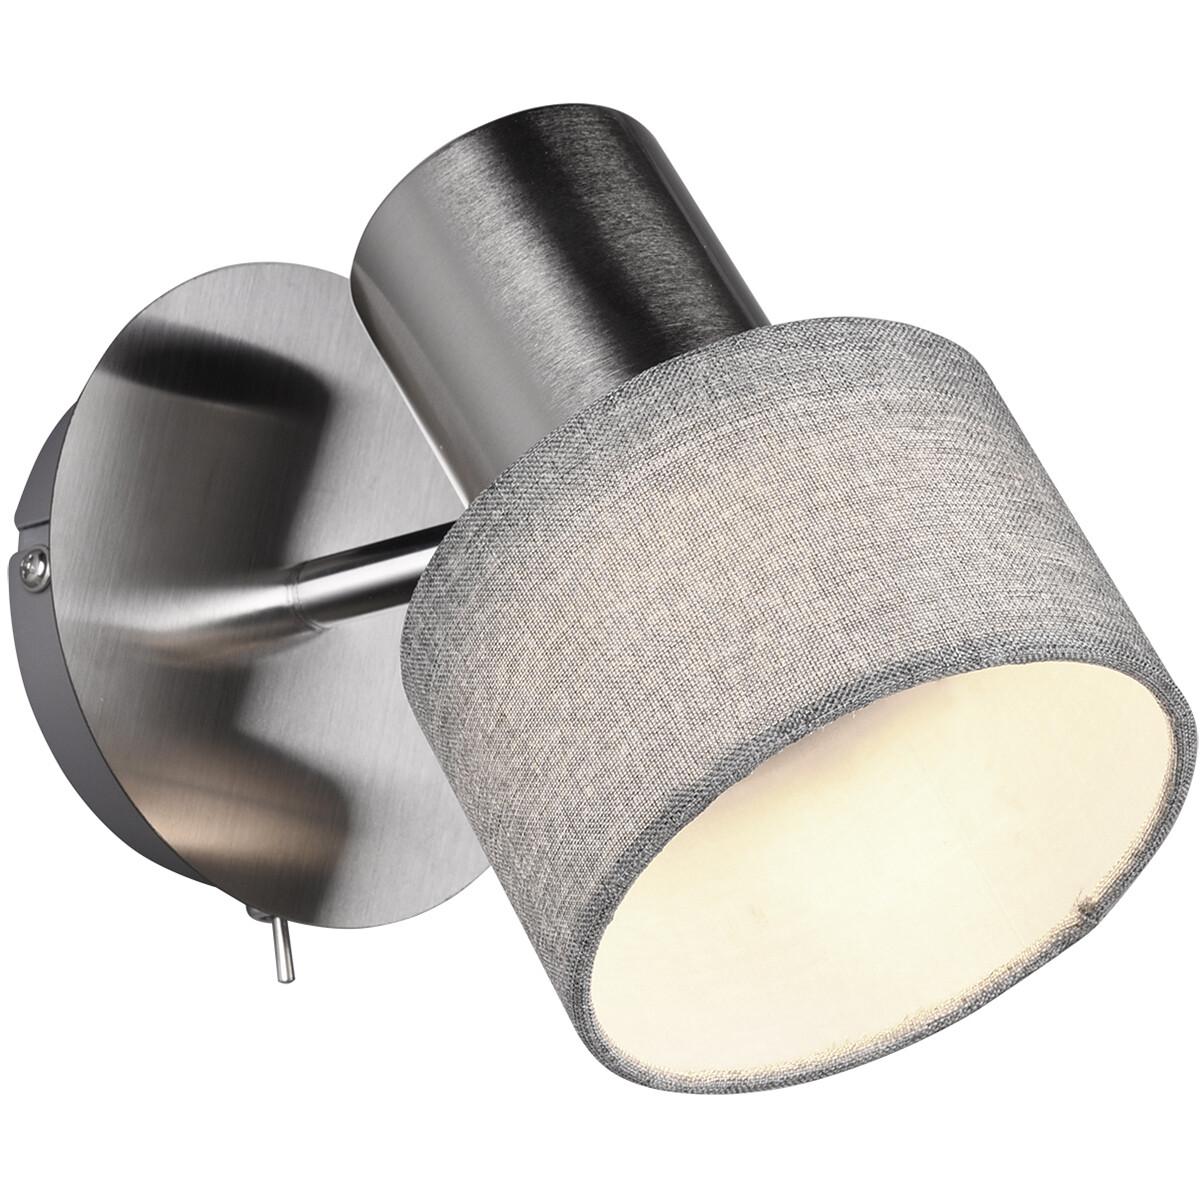 LED Wandspot - Trion Waler - GU10 Fitting - Rond - Mat Nikkel - Aluminium